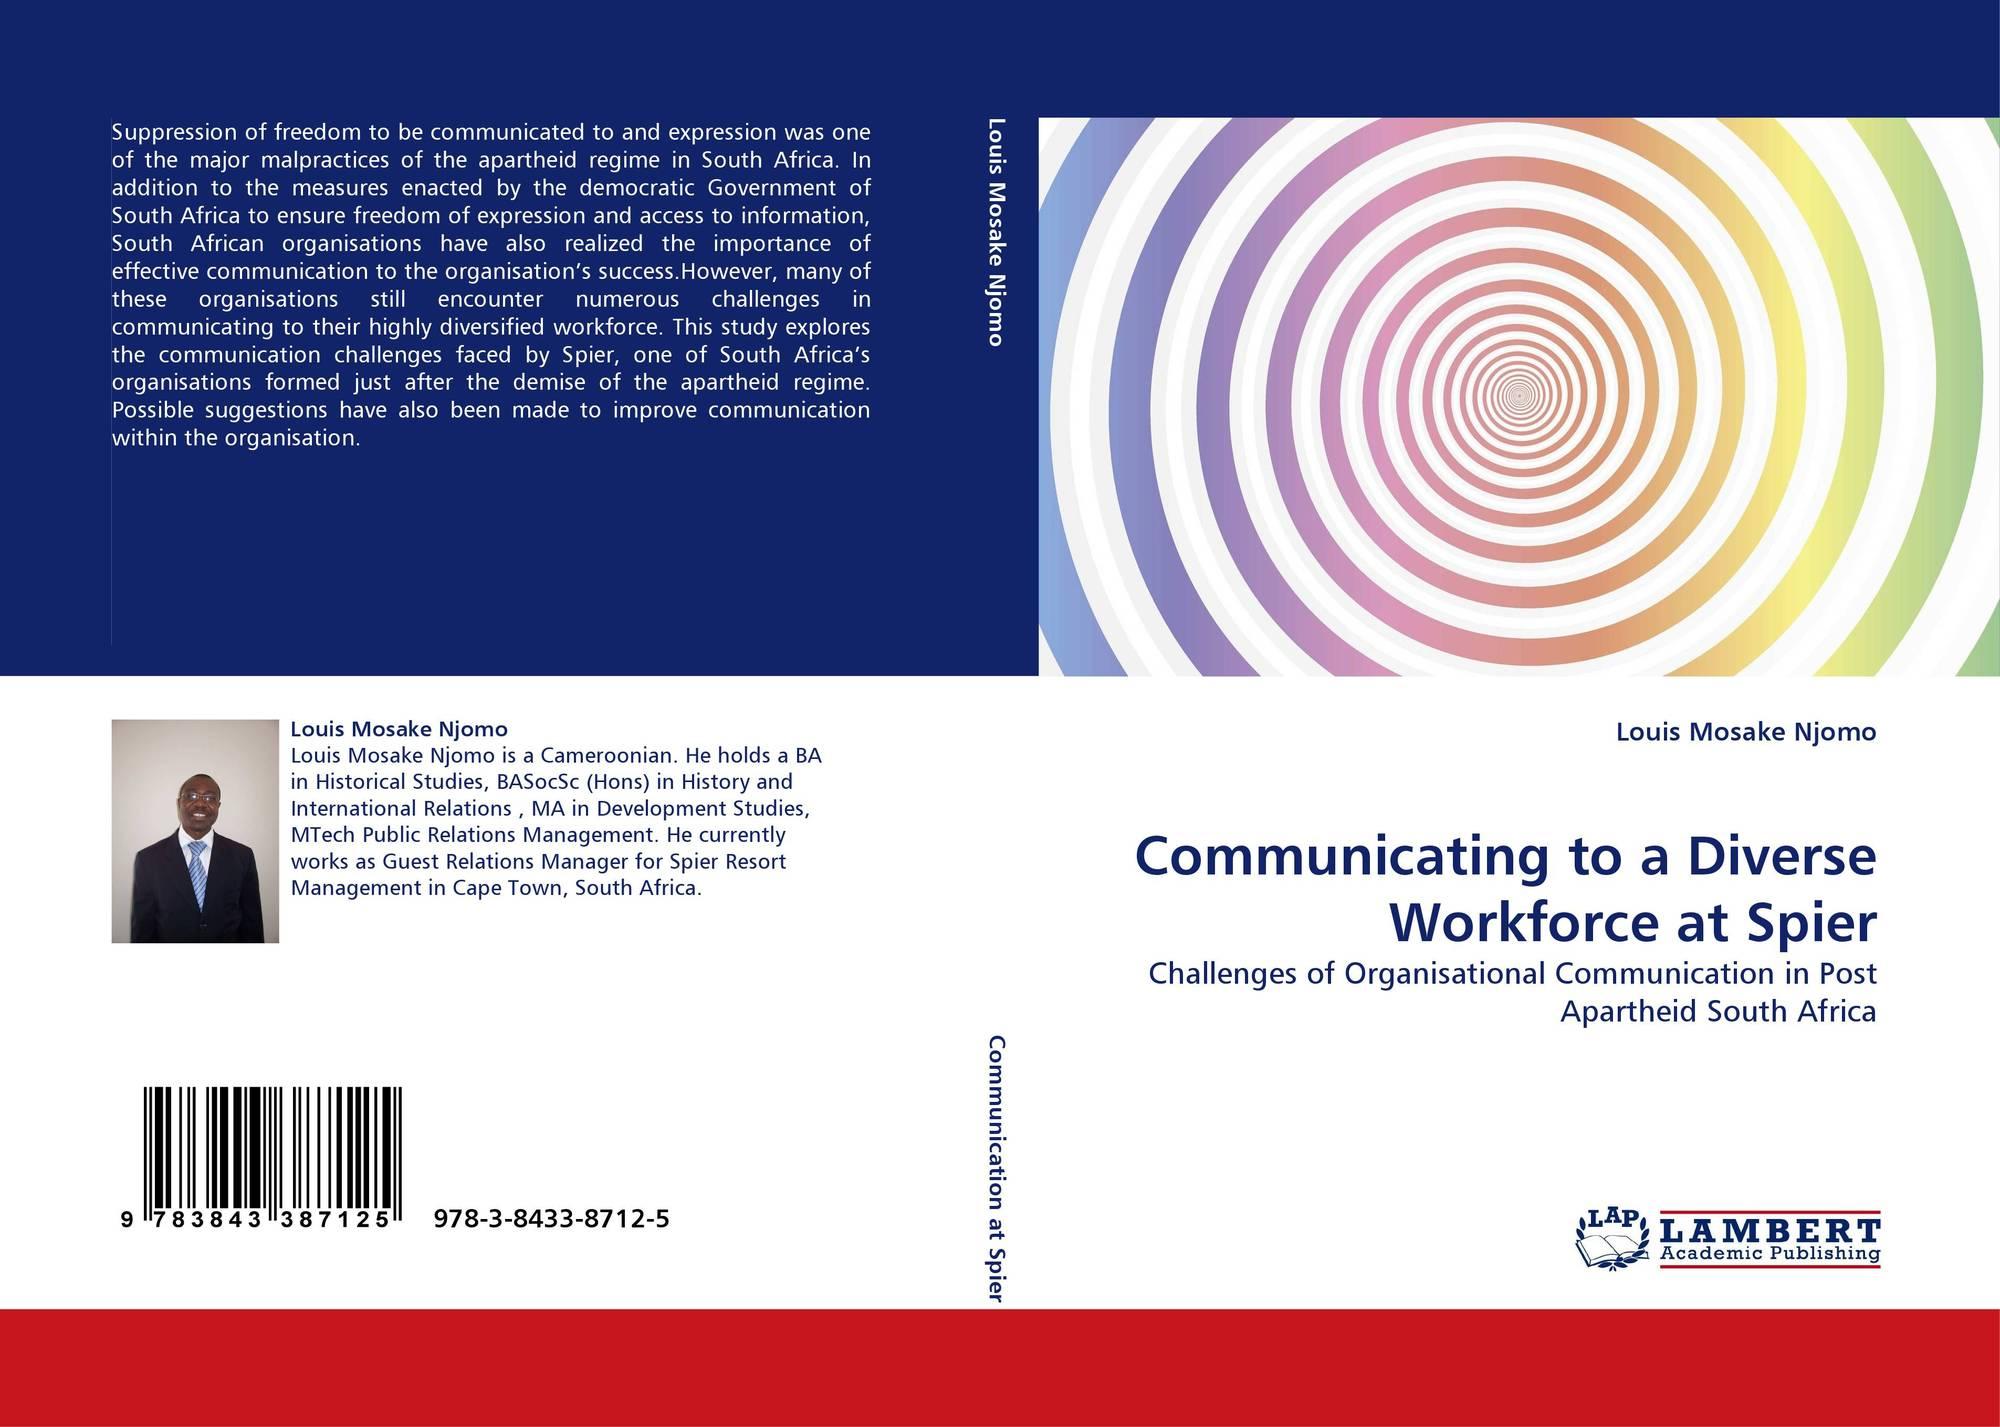 the challenge of organizational communication